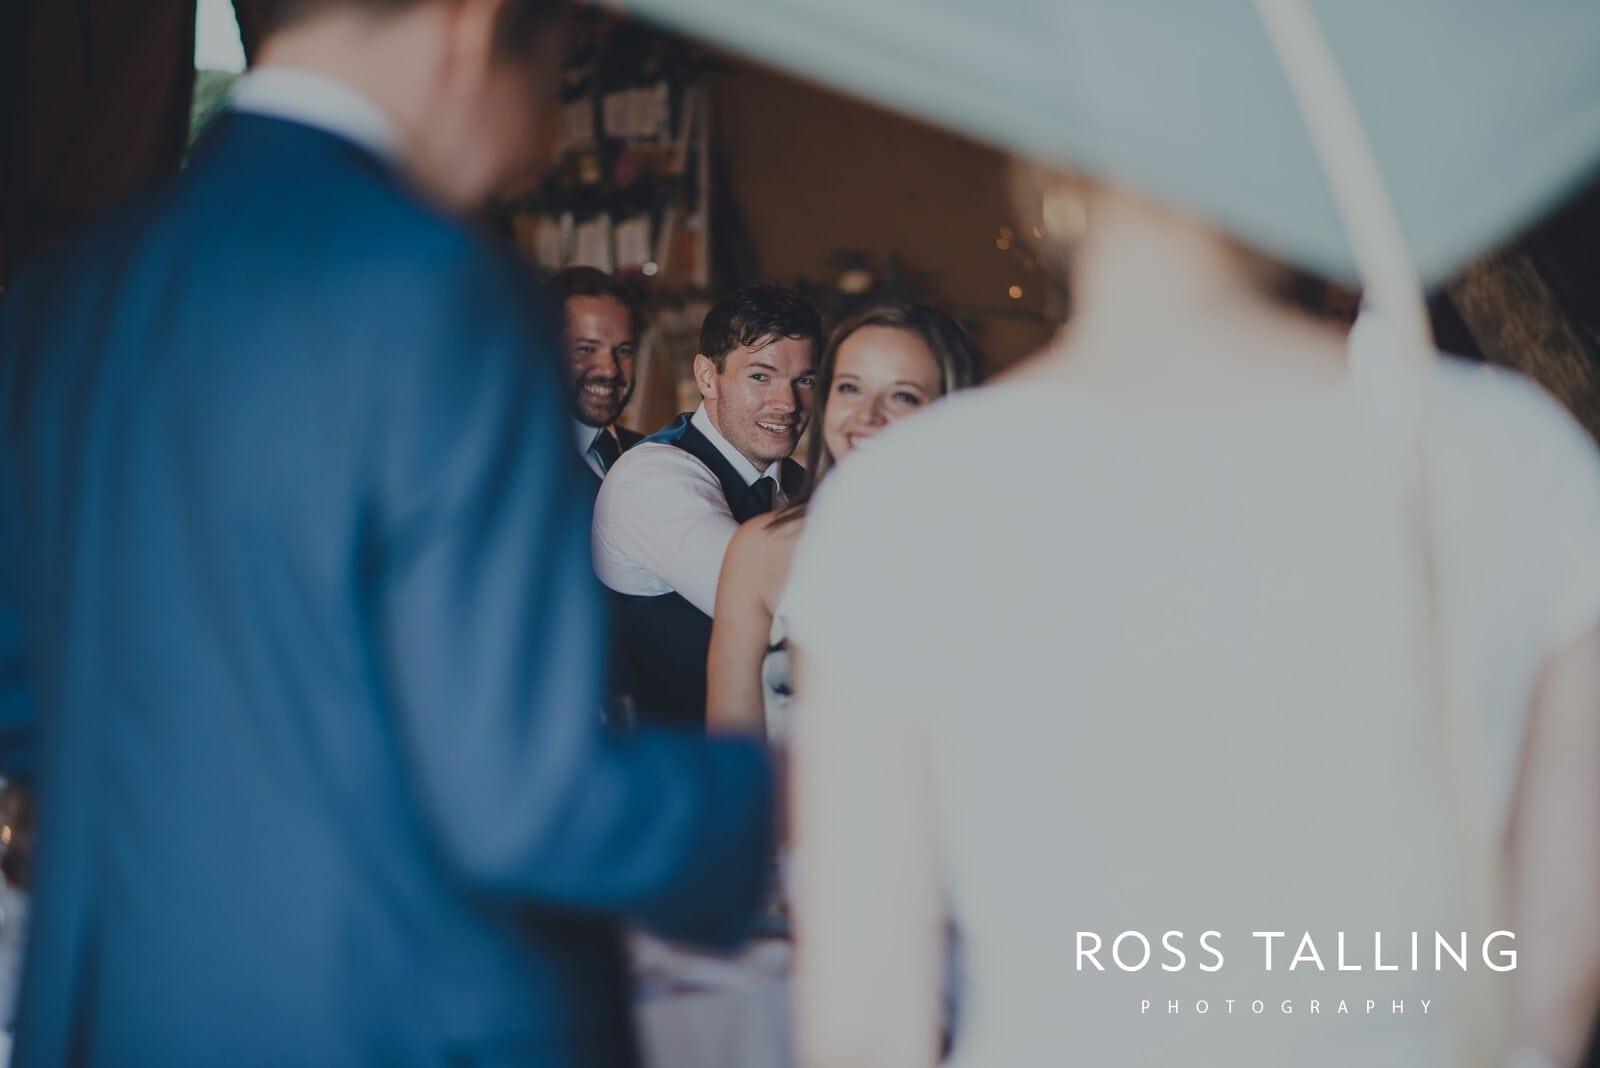 laura-matts-rosevine-hotel-wedding-photography-cornwall_0176